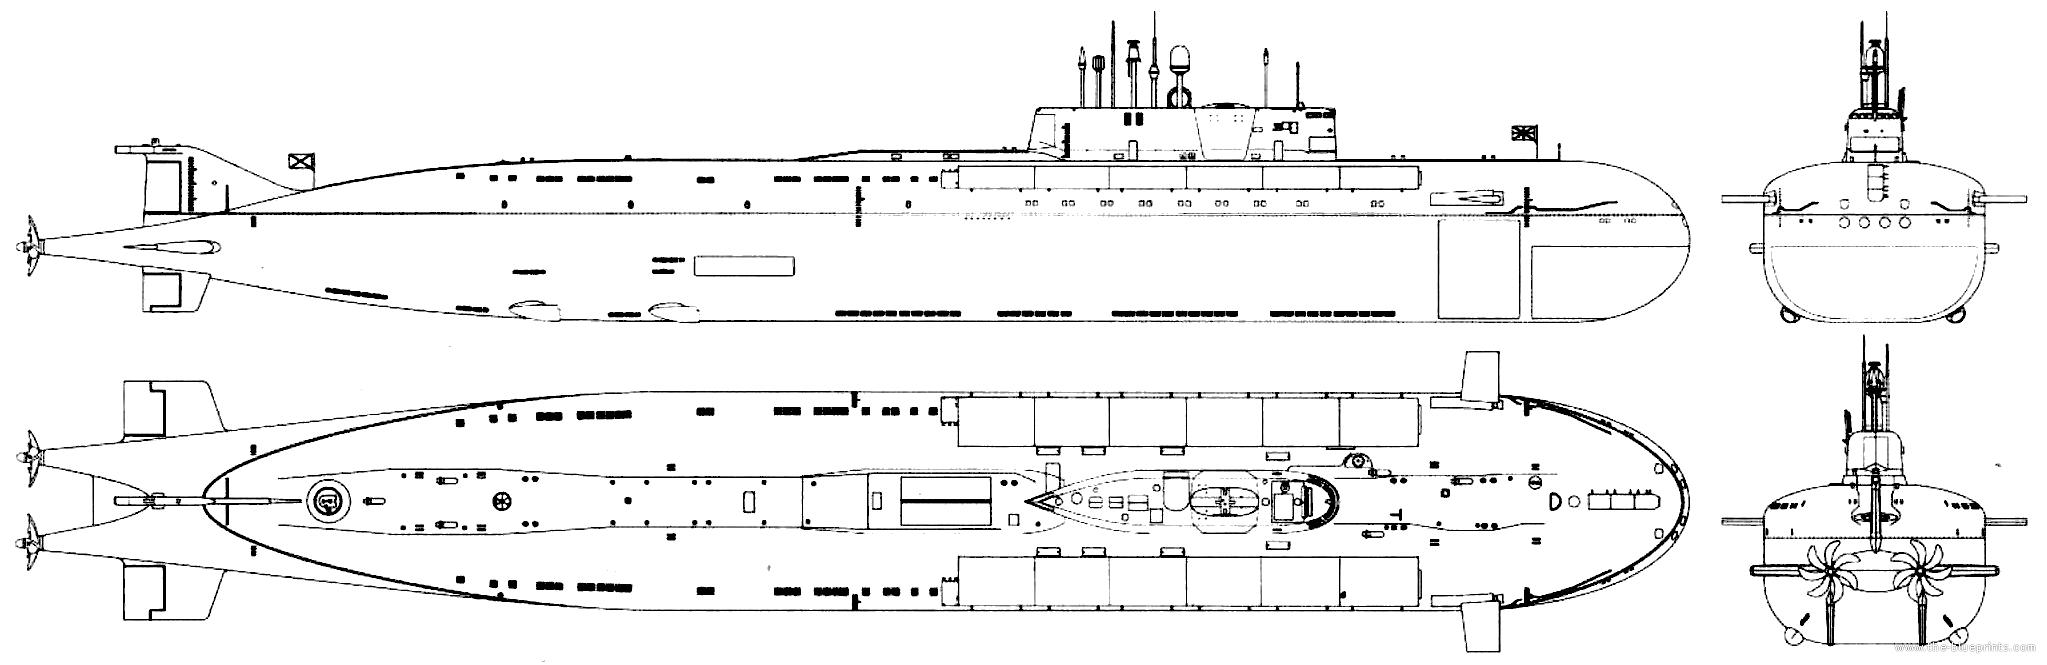 проект 949а